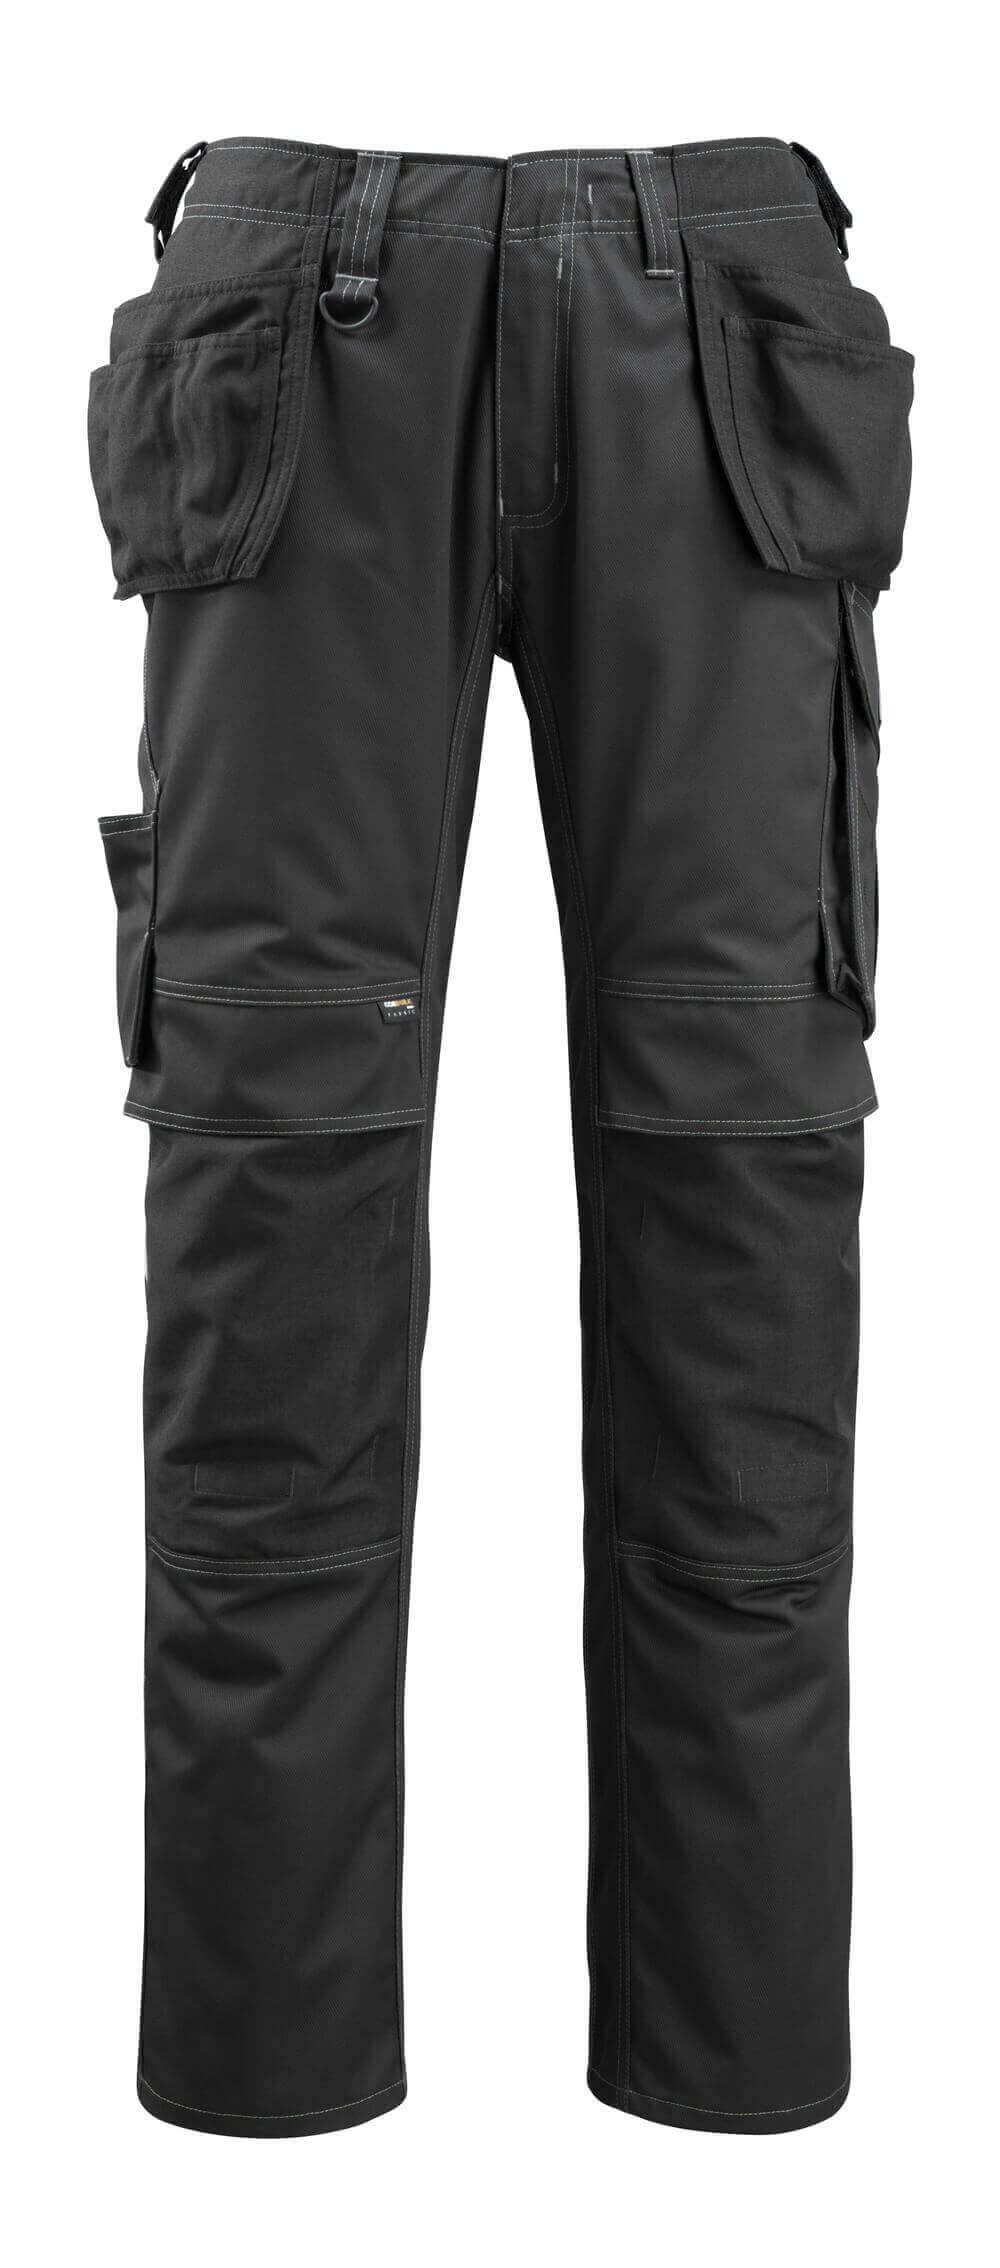 14131-203-09 Pantalon avec poches flottantes - Noir